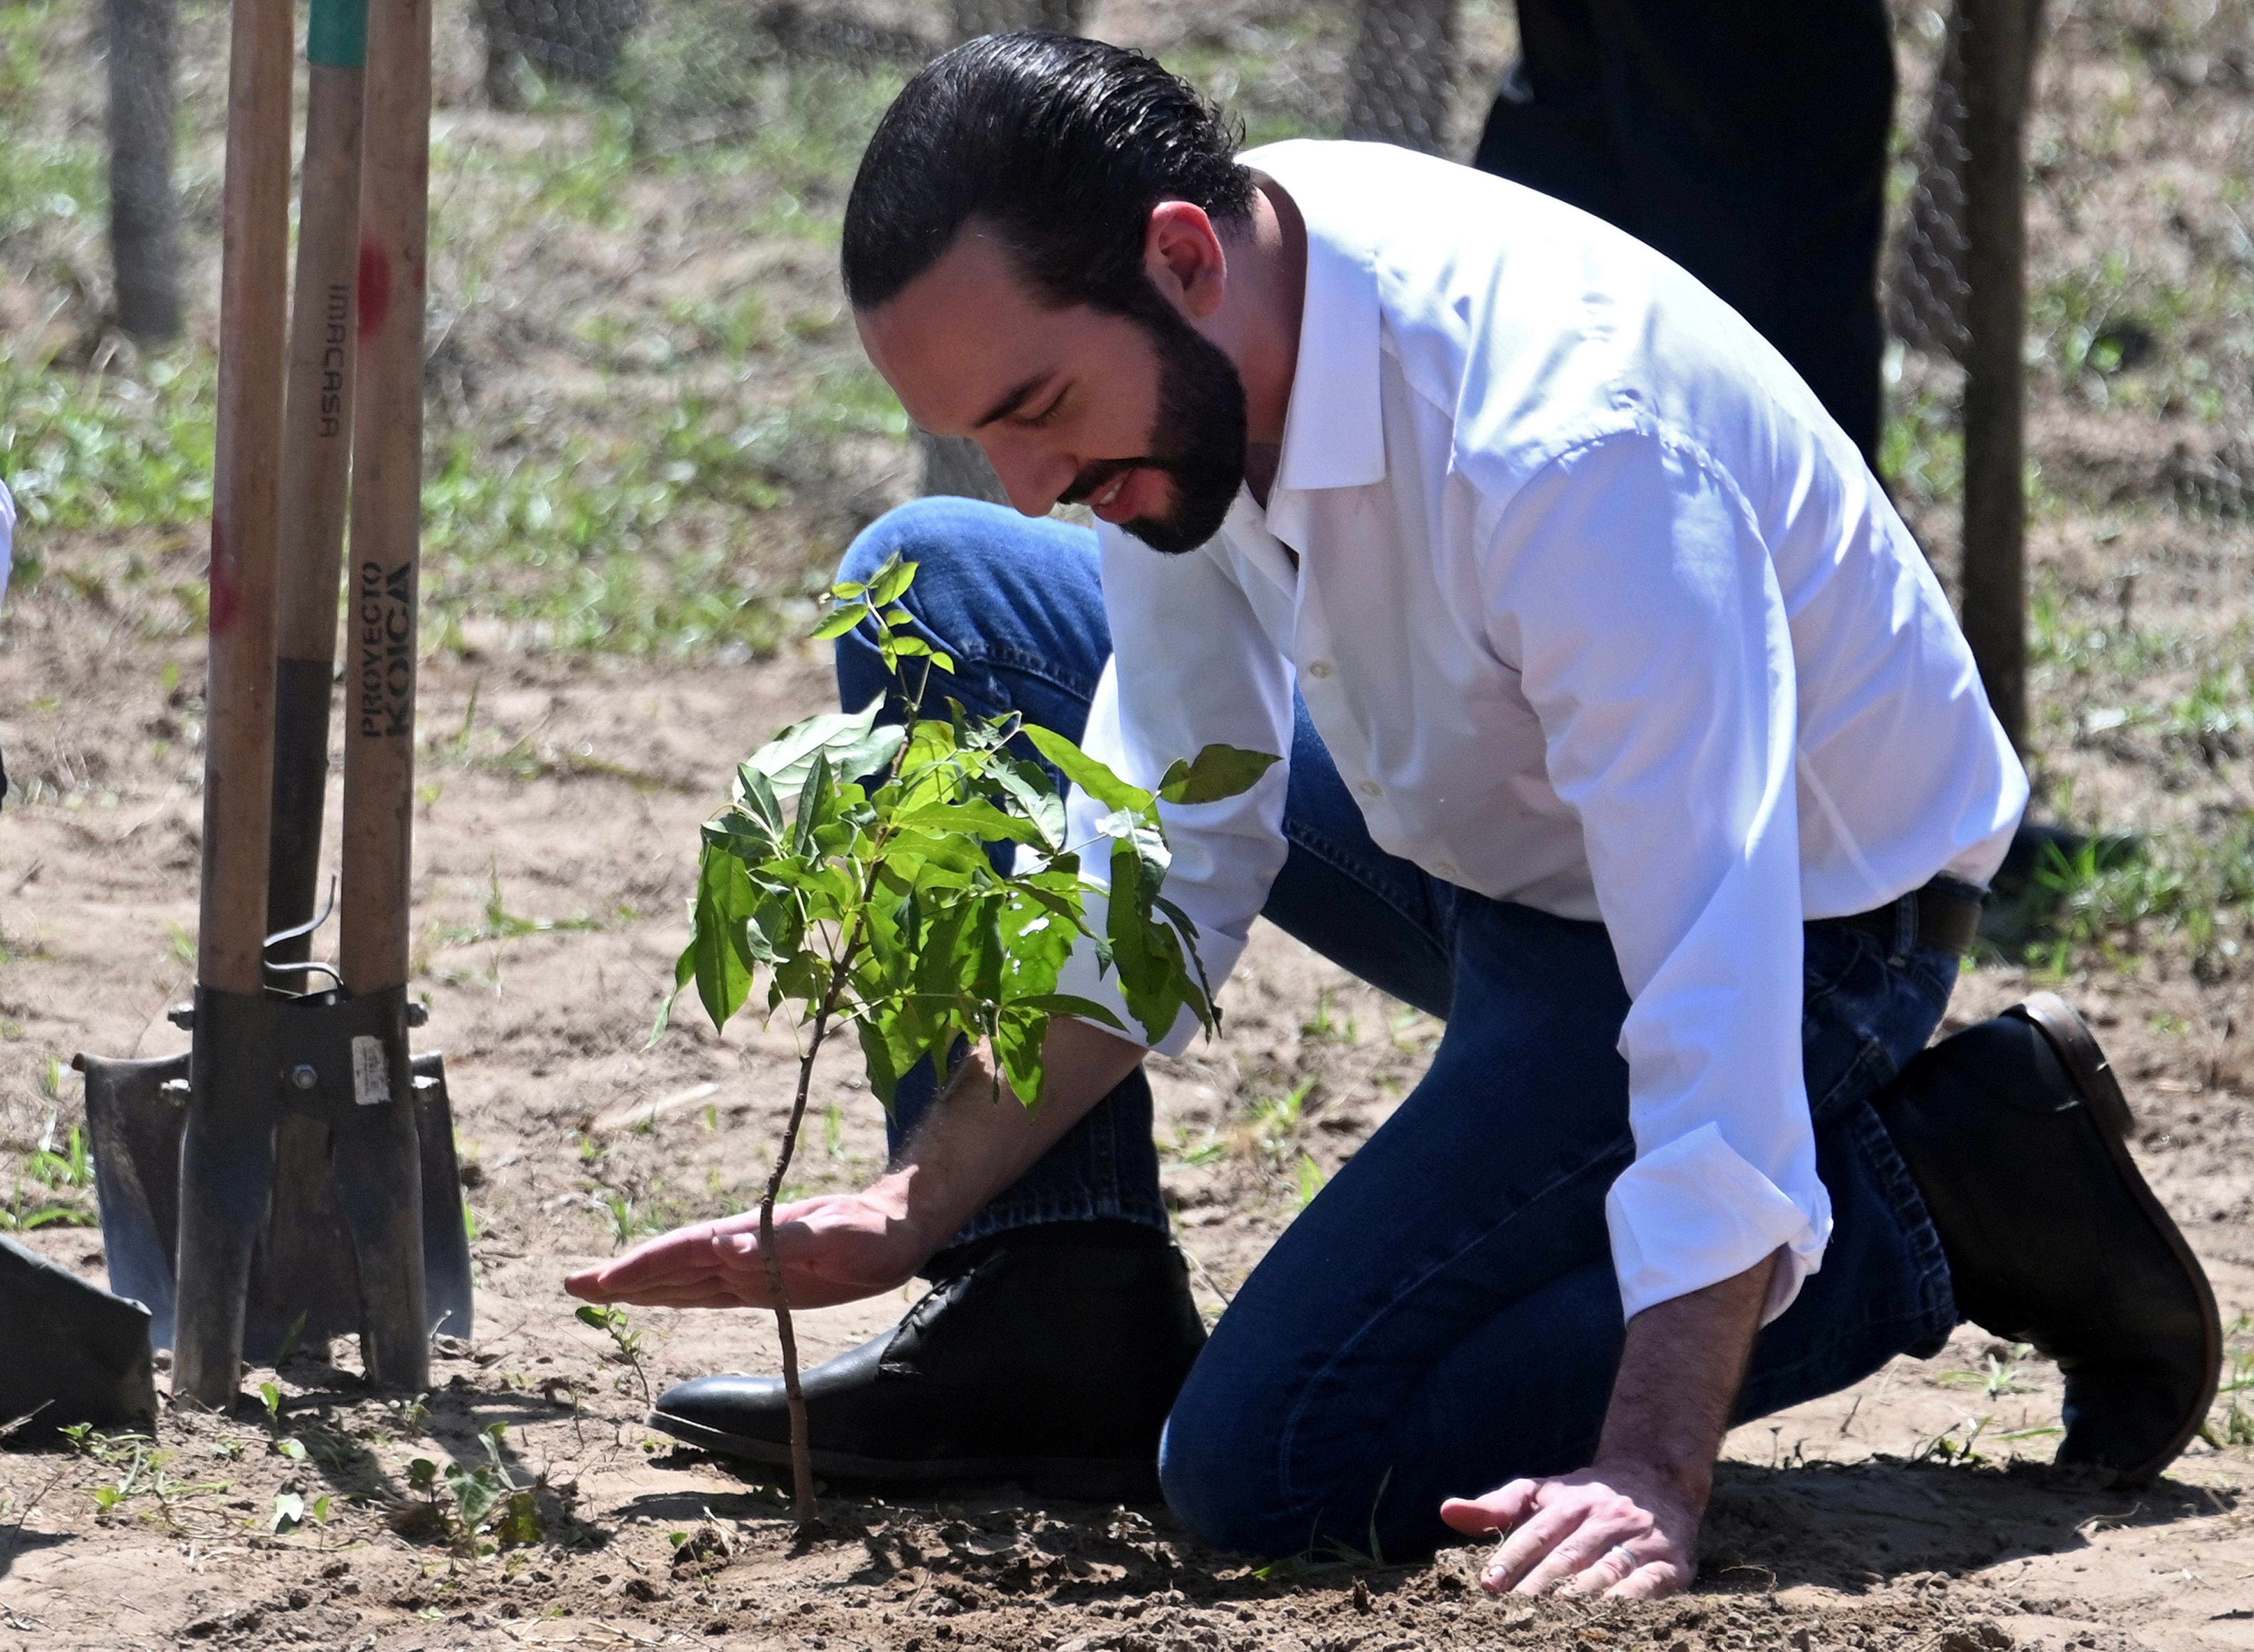 Orbánék bealudtak Gábor Zsazsa trash-temetésén, a sátáni Cukkemberg zsidó pulival poralizál